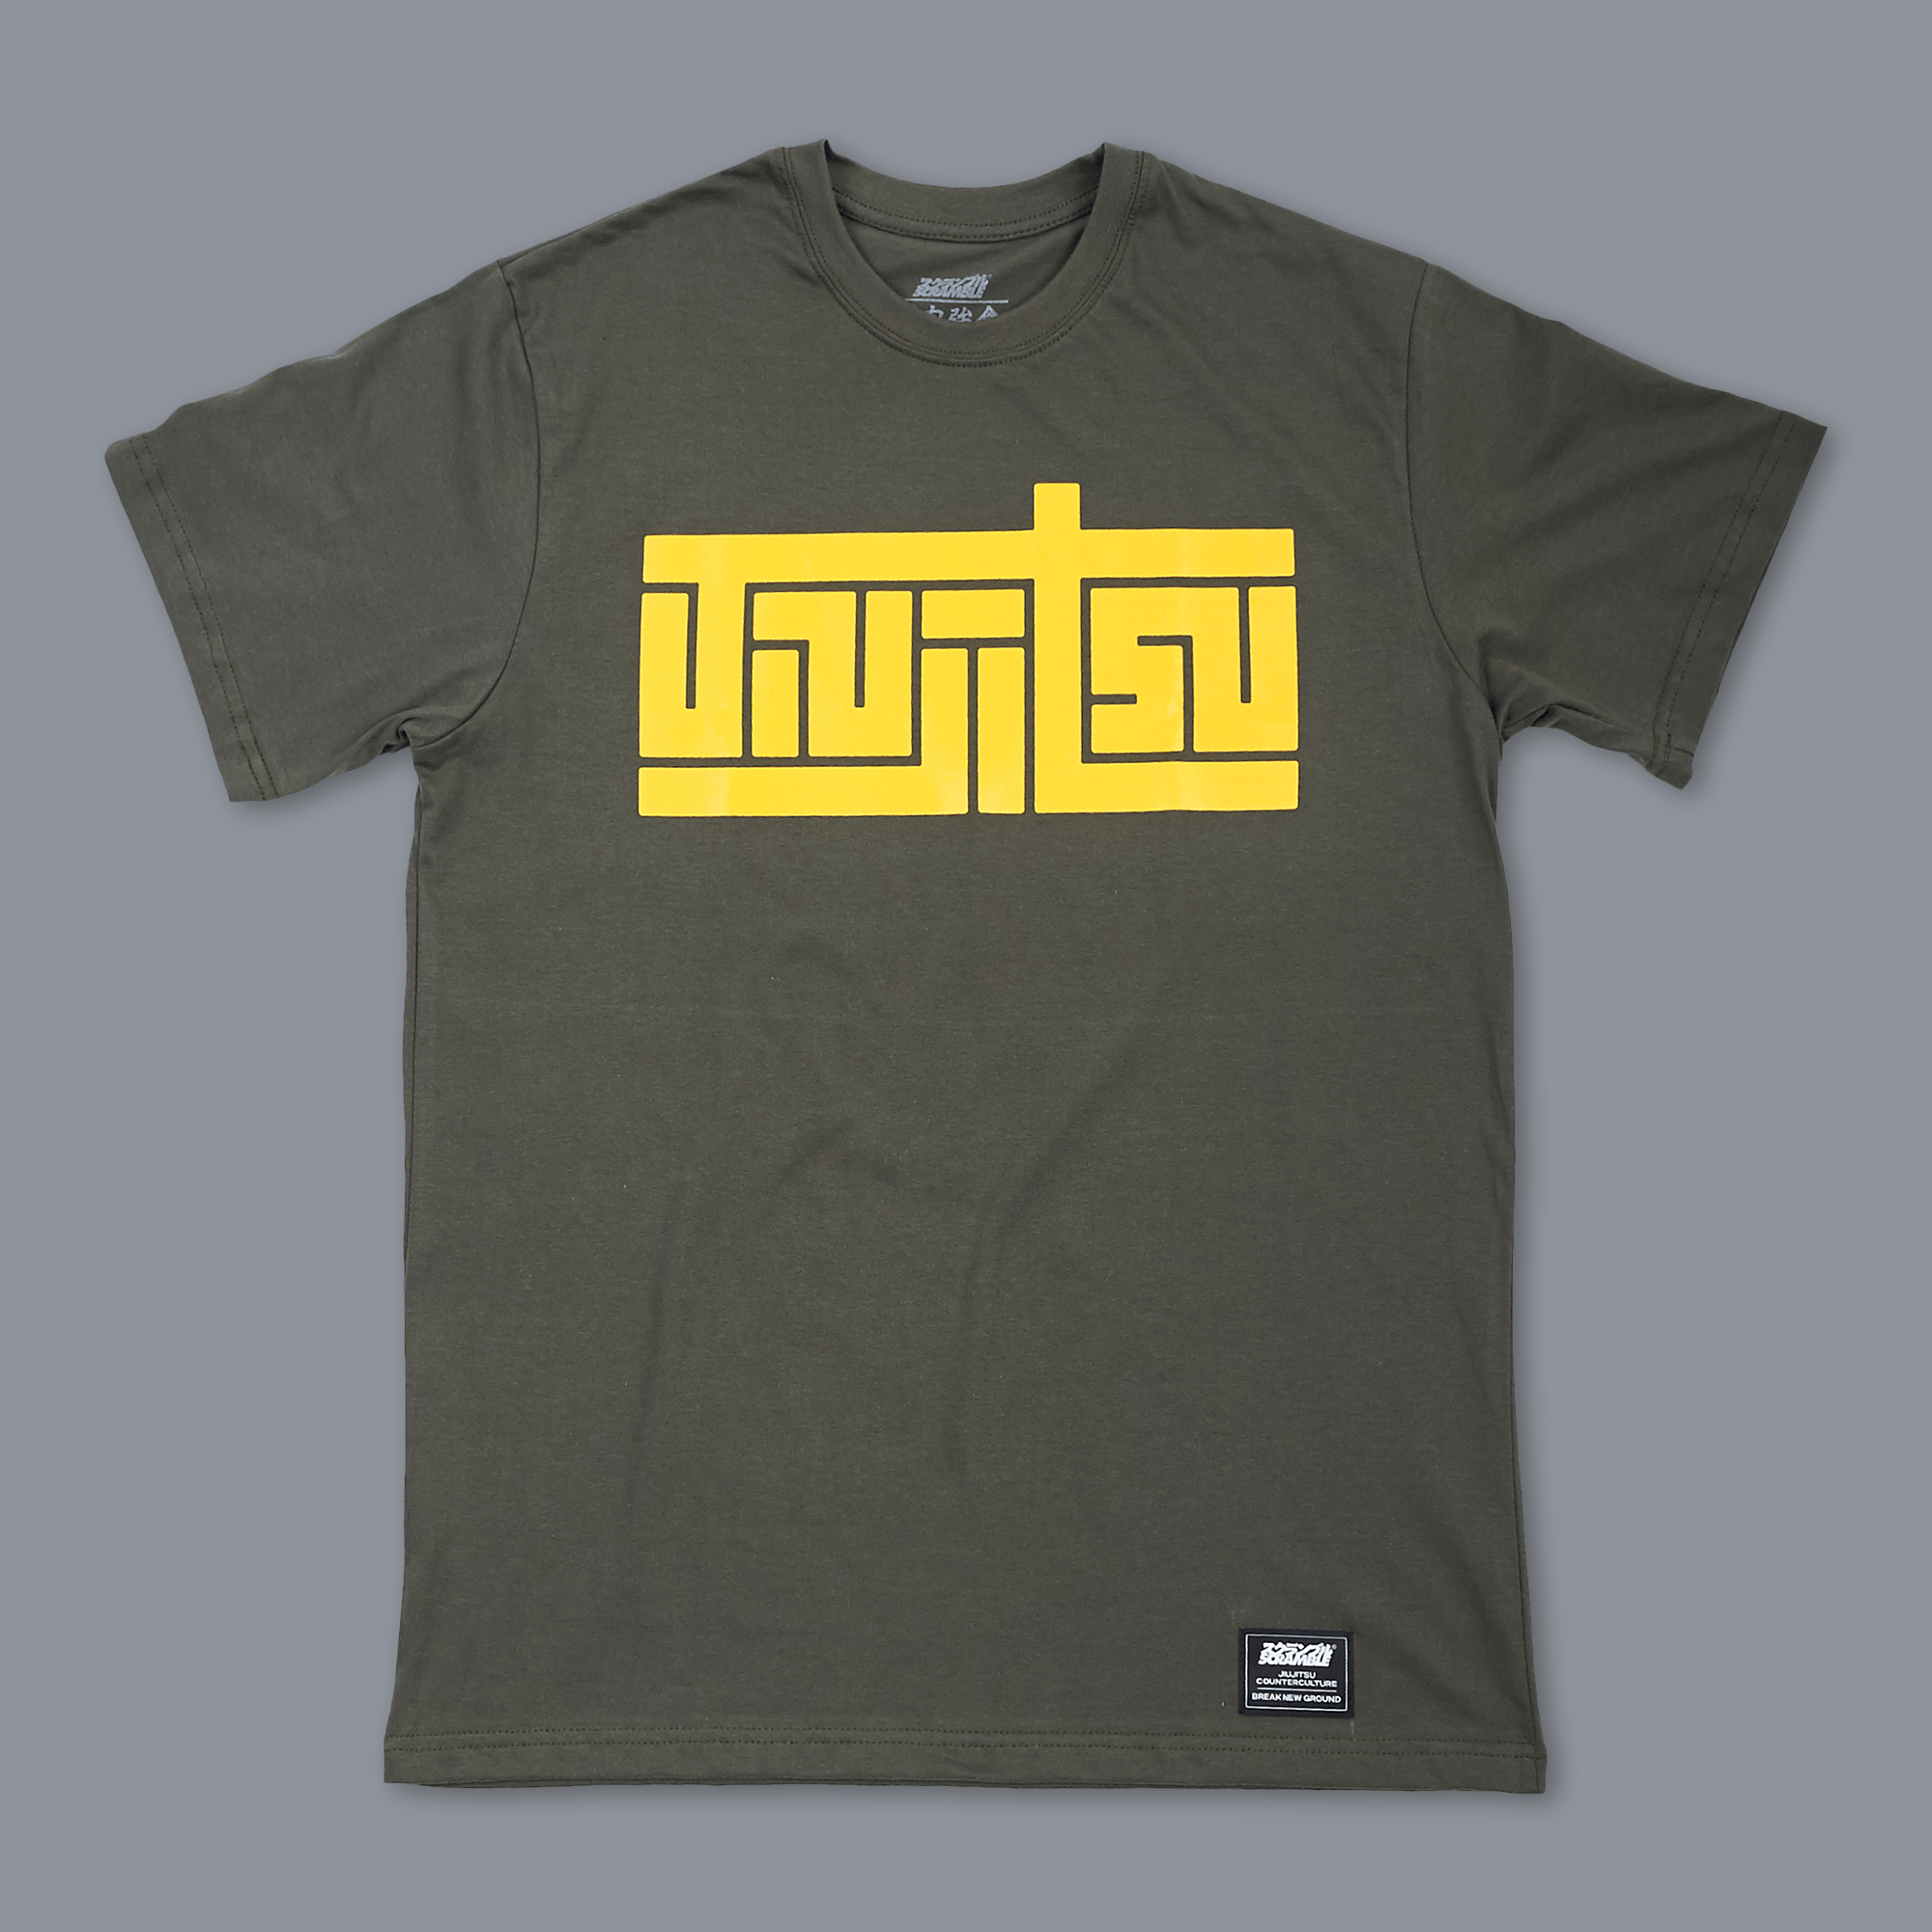 Scramble Block Tee - Green|格闘技、柔術Tシャツ